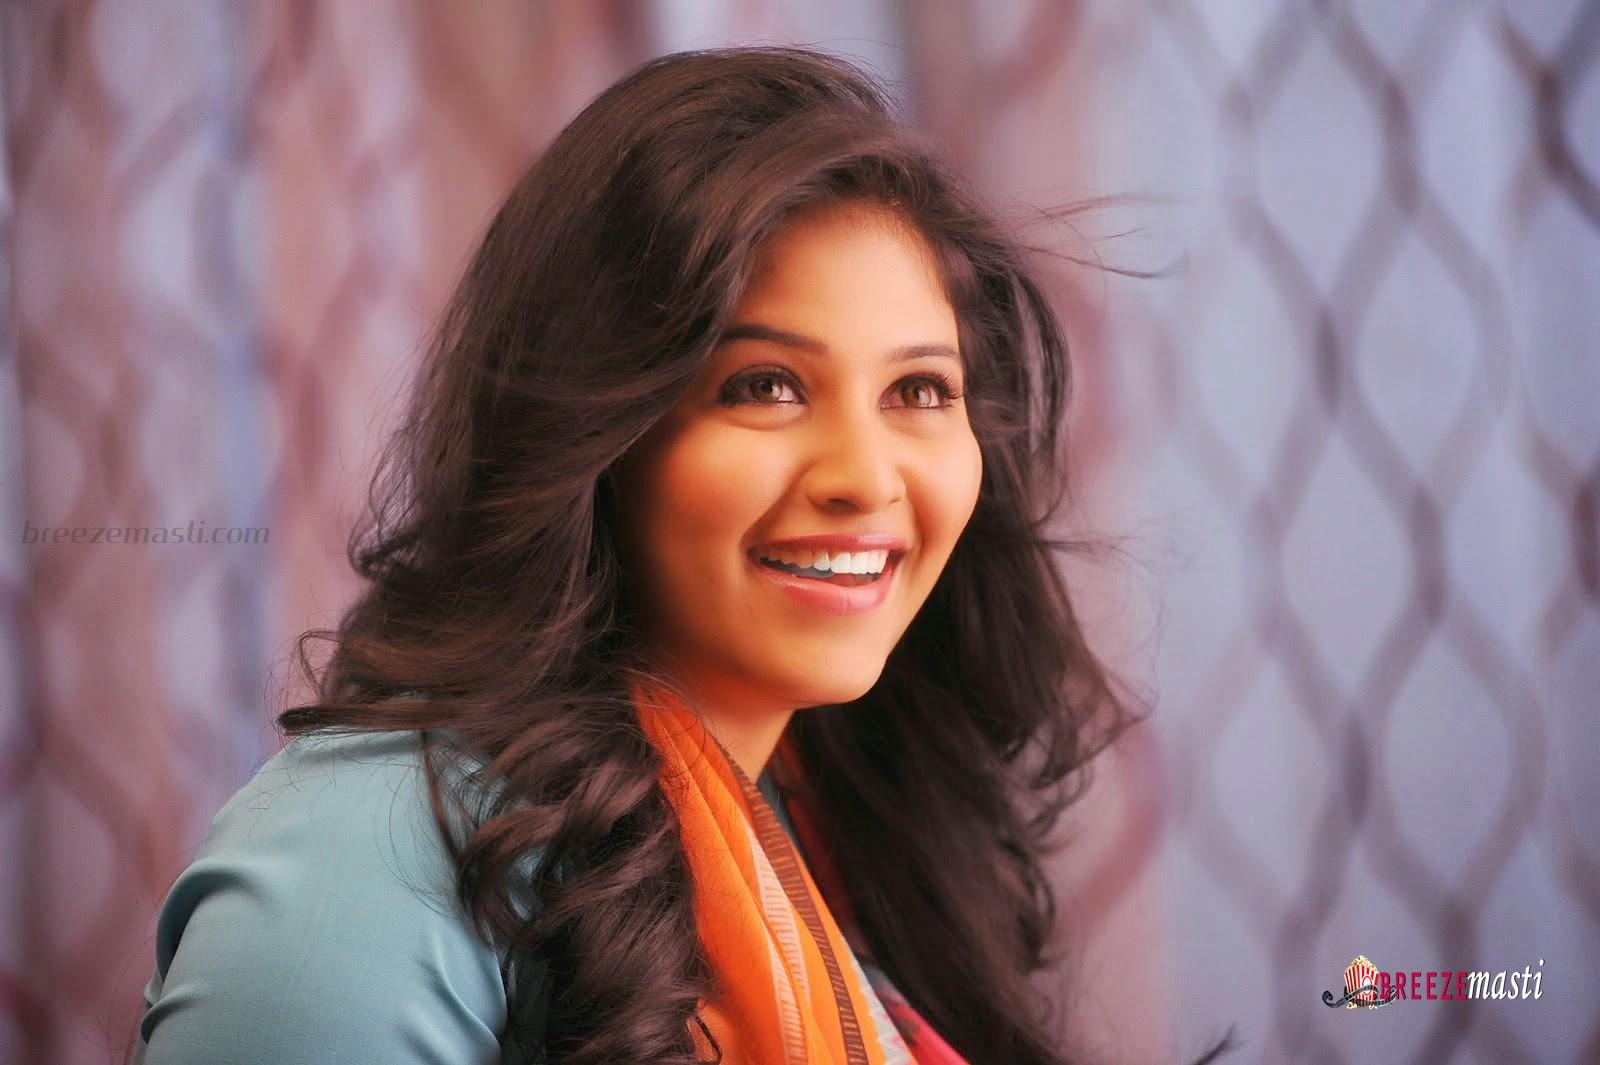 aanjali south actress hd wallpaper download | wallpapper